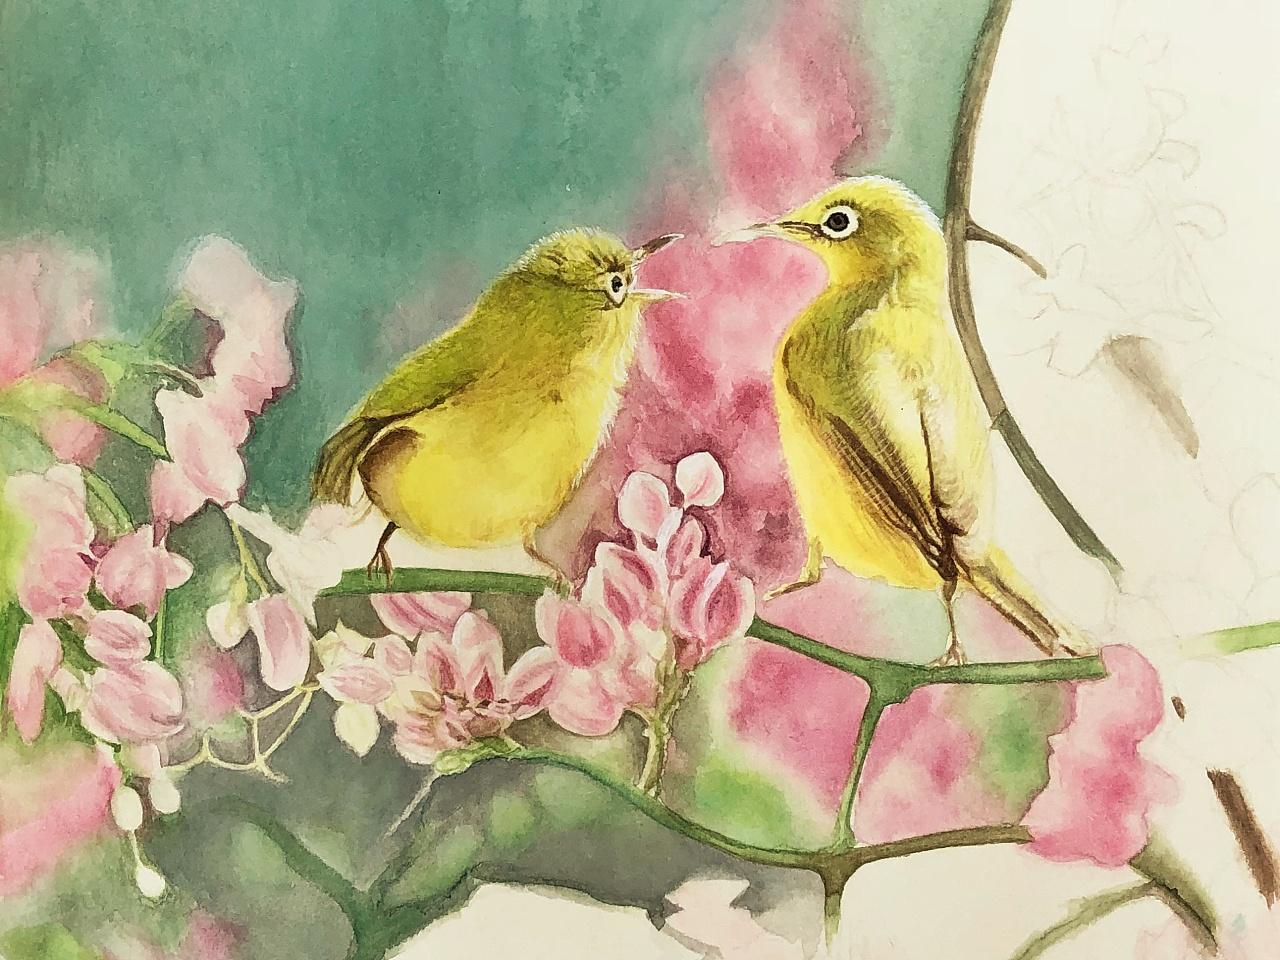 绣眼鸟-水彩手绘